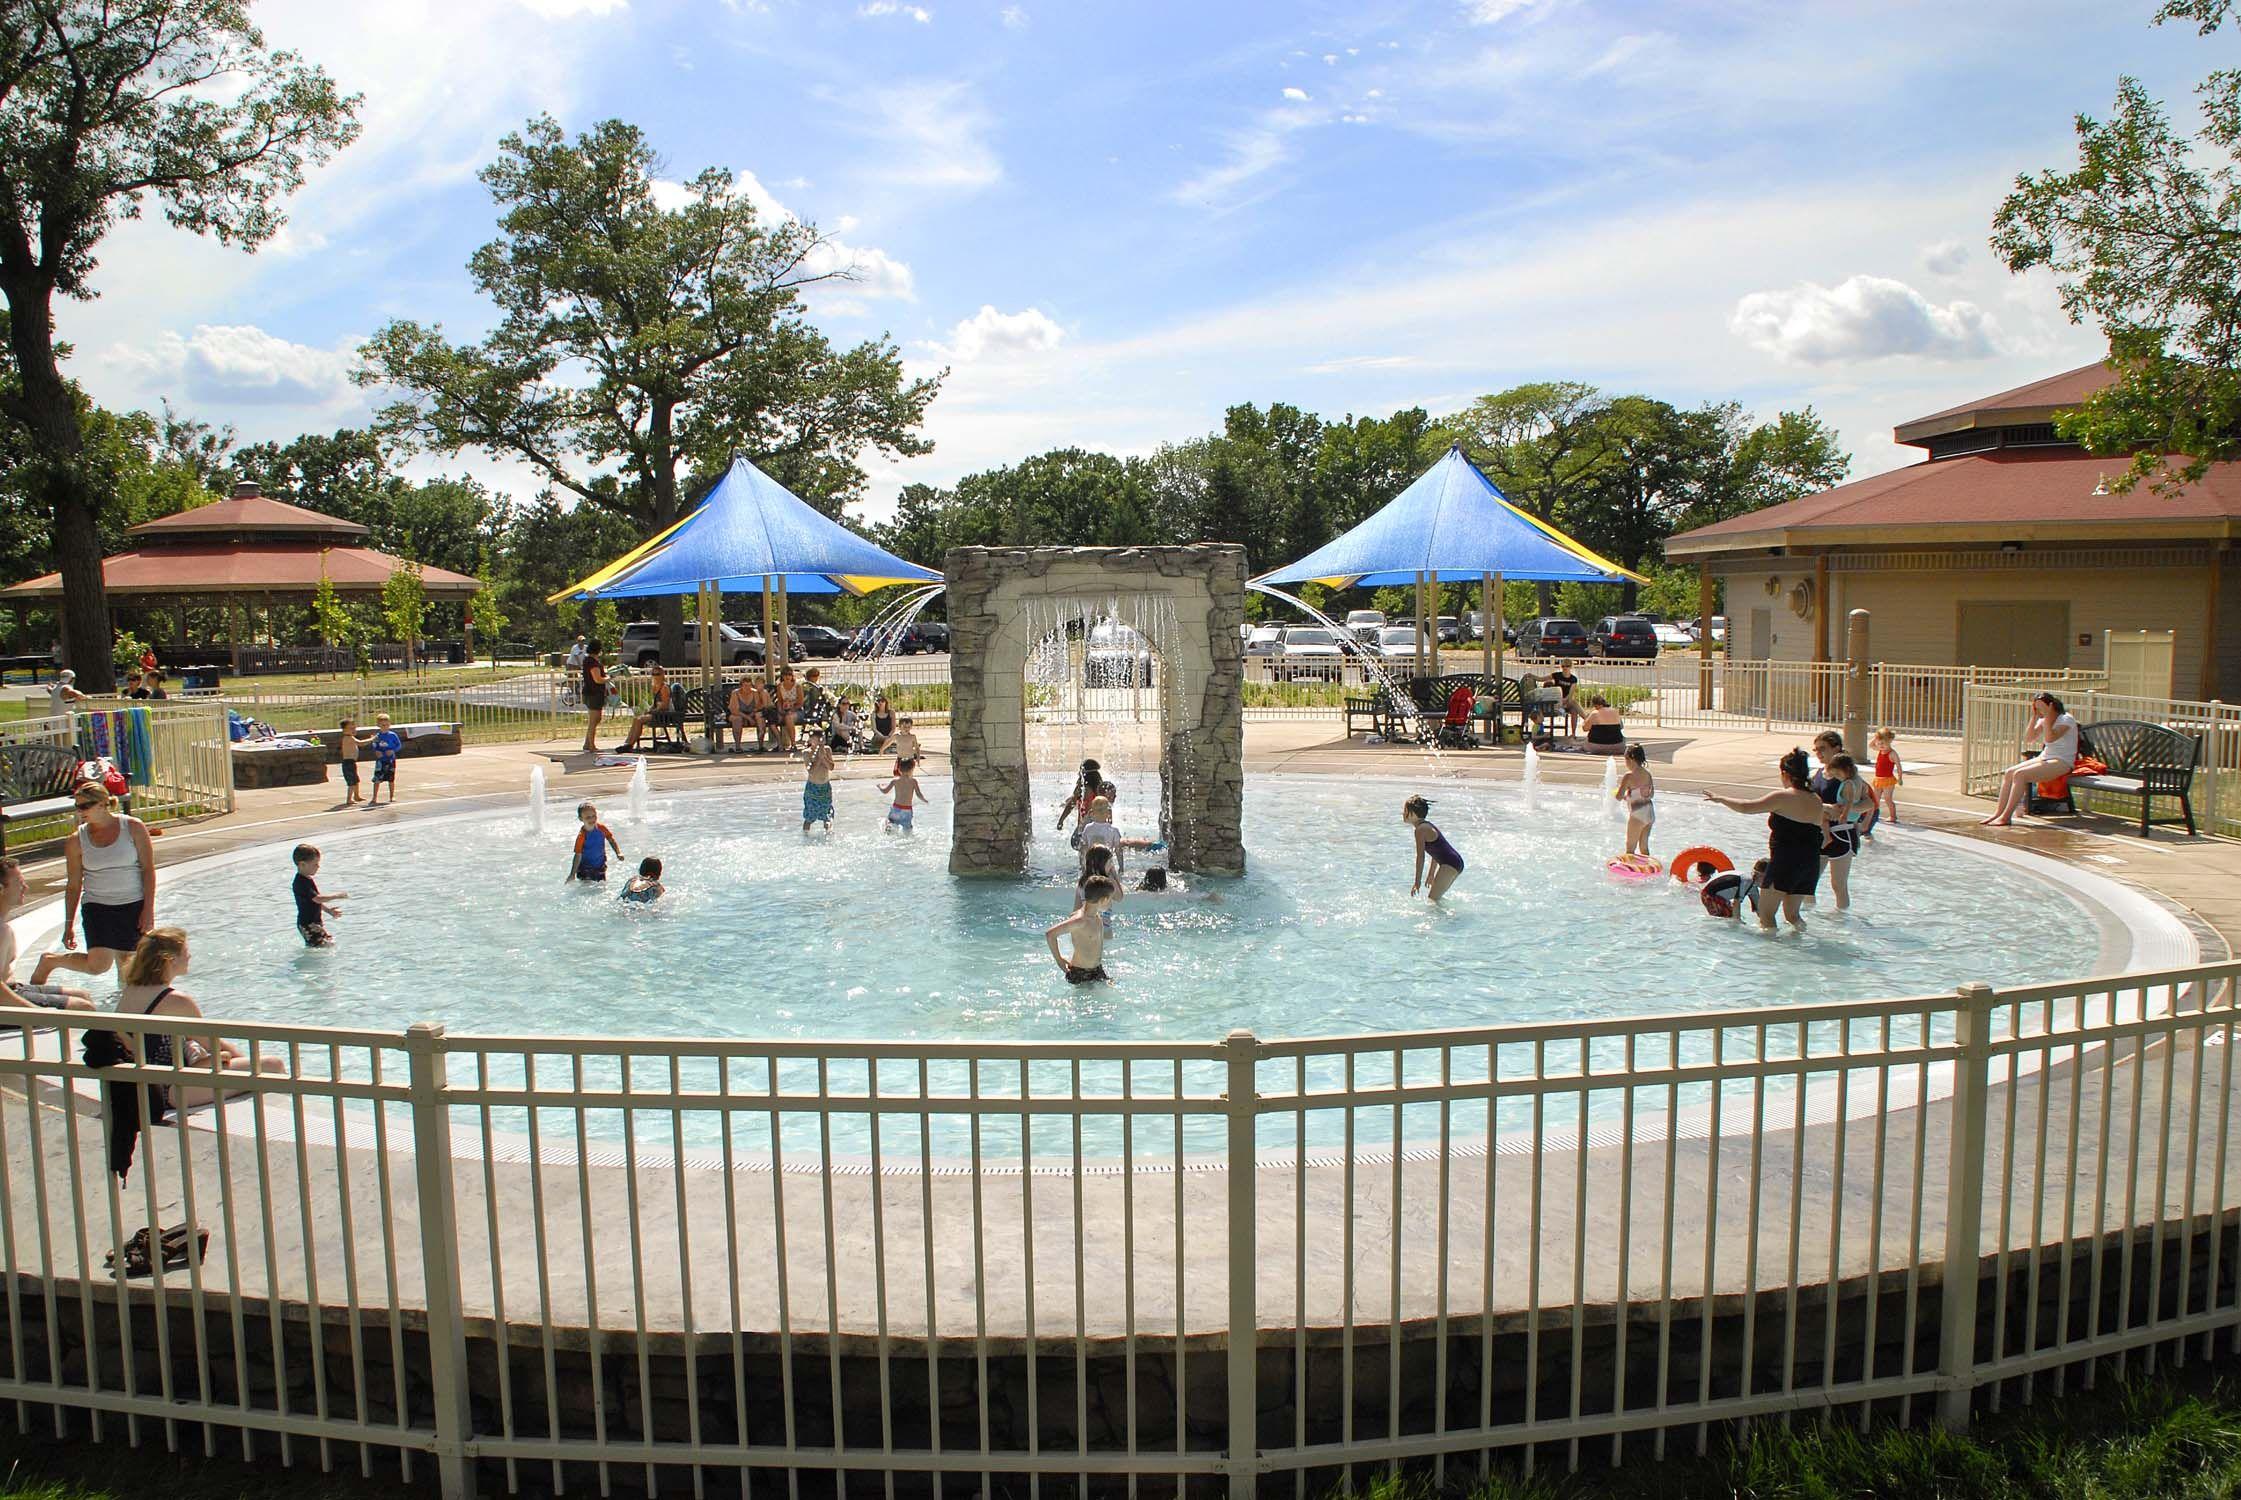 Minnehaha Park Falls Wabun Picnic Area Wading Pool Fun Places To Go Cool Pools Minnehaha Park